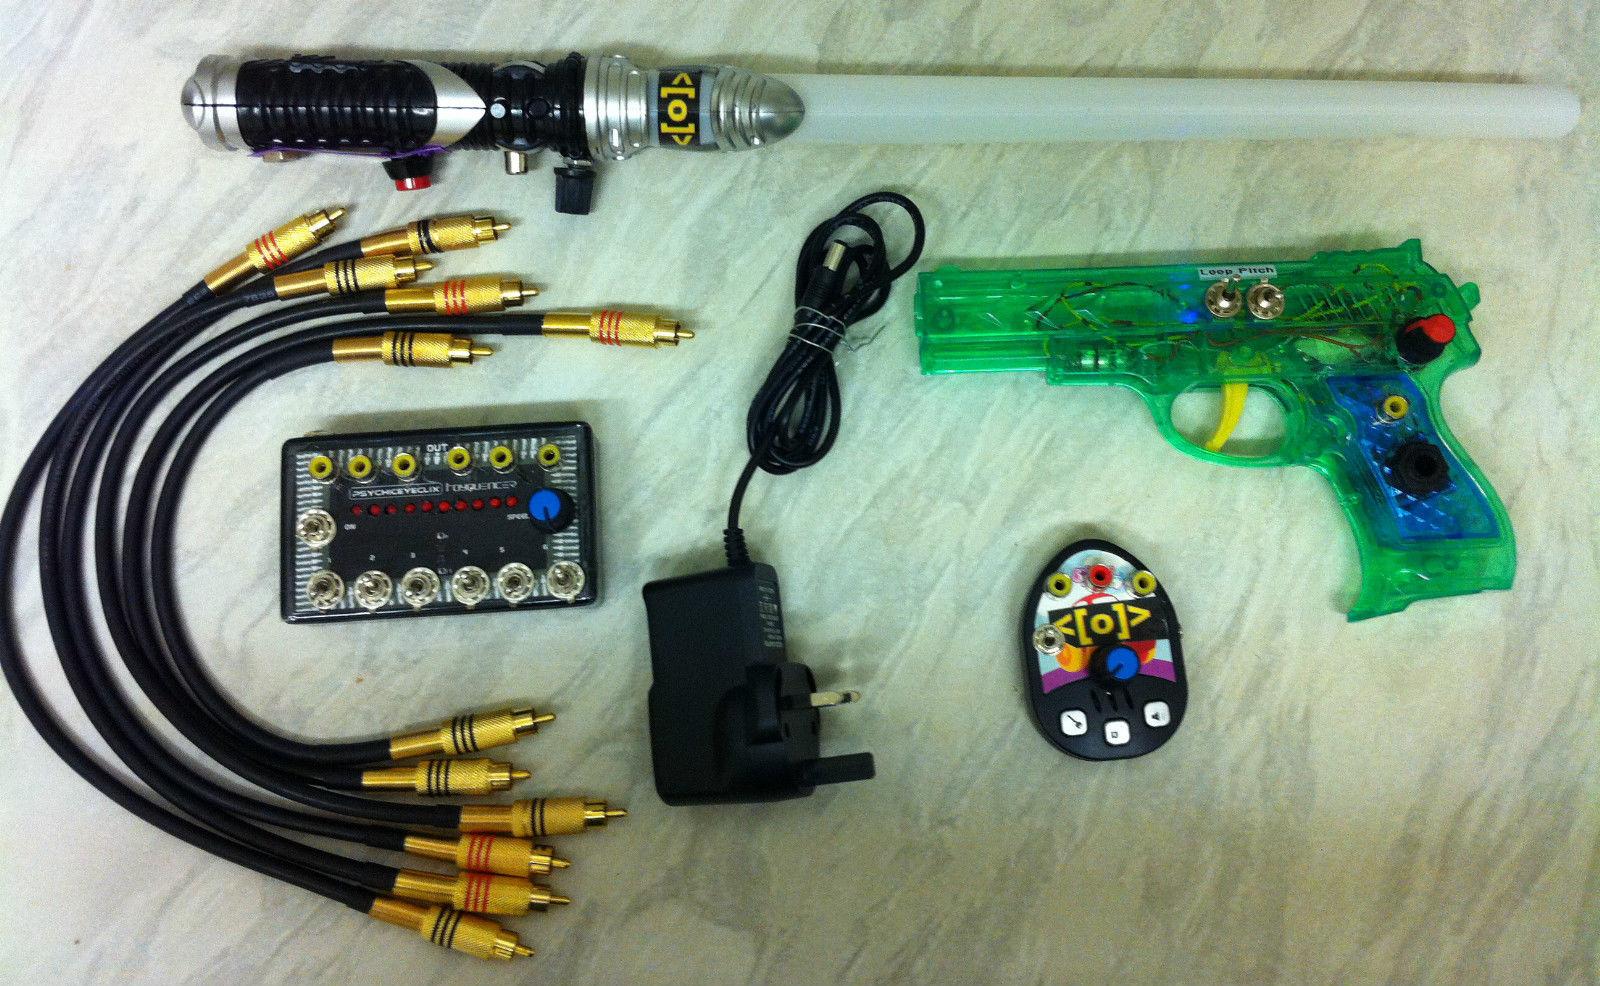 Circuit Bent Toy Gun Fx Synth Noise Drone Glitch Ebay